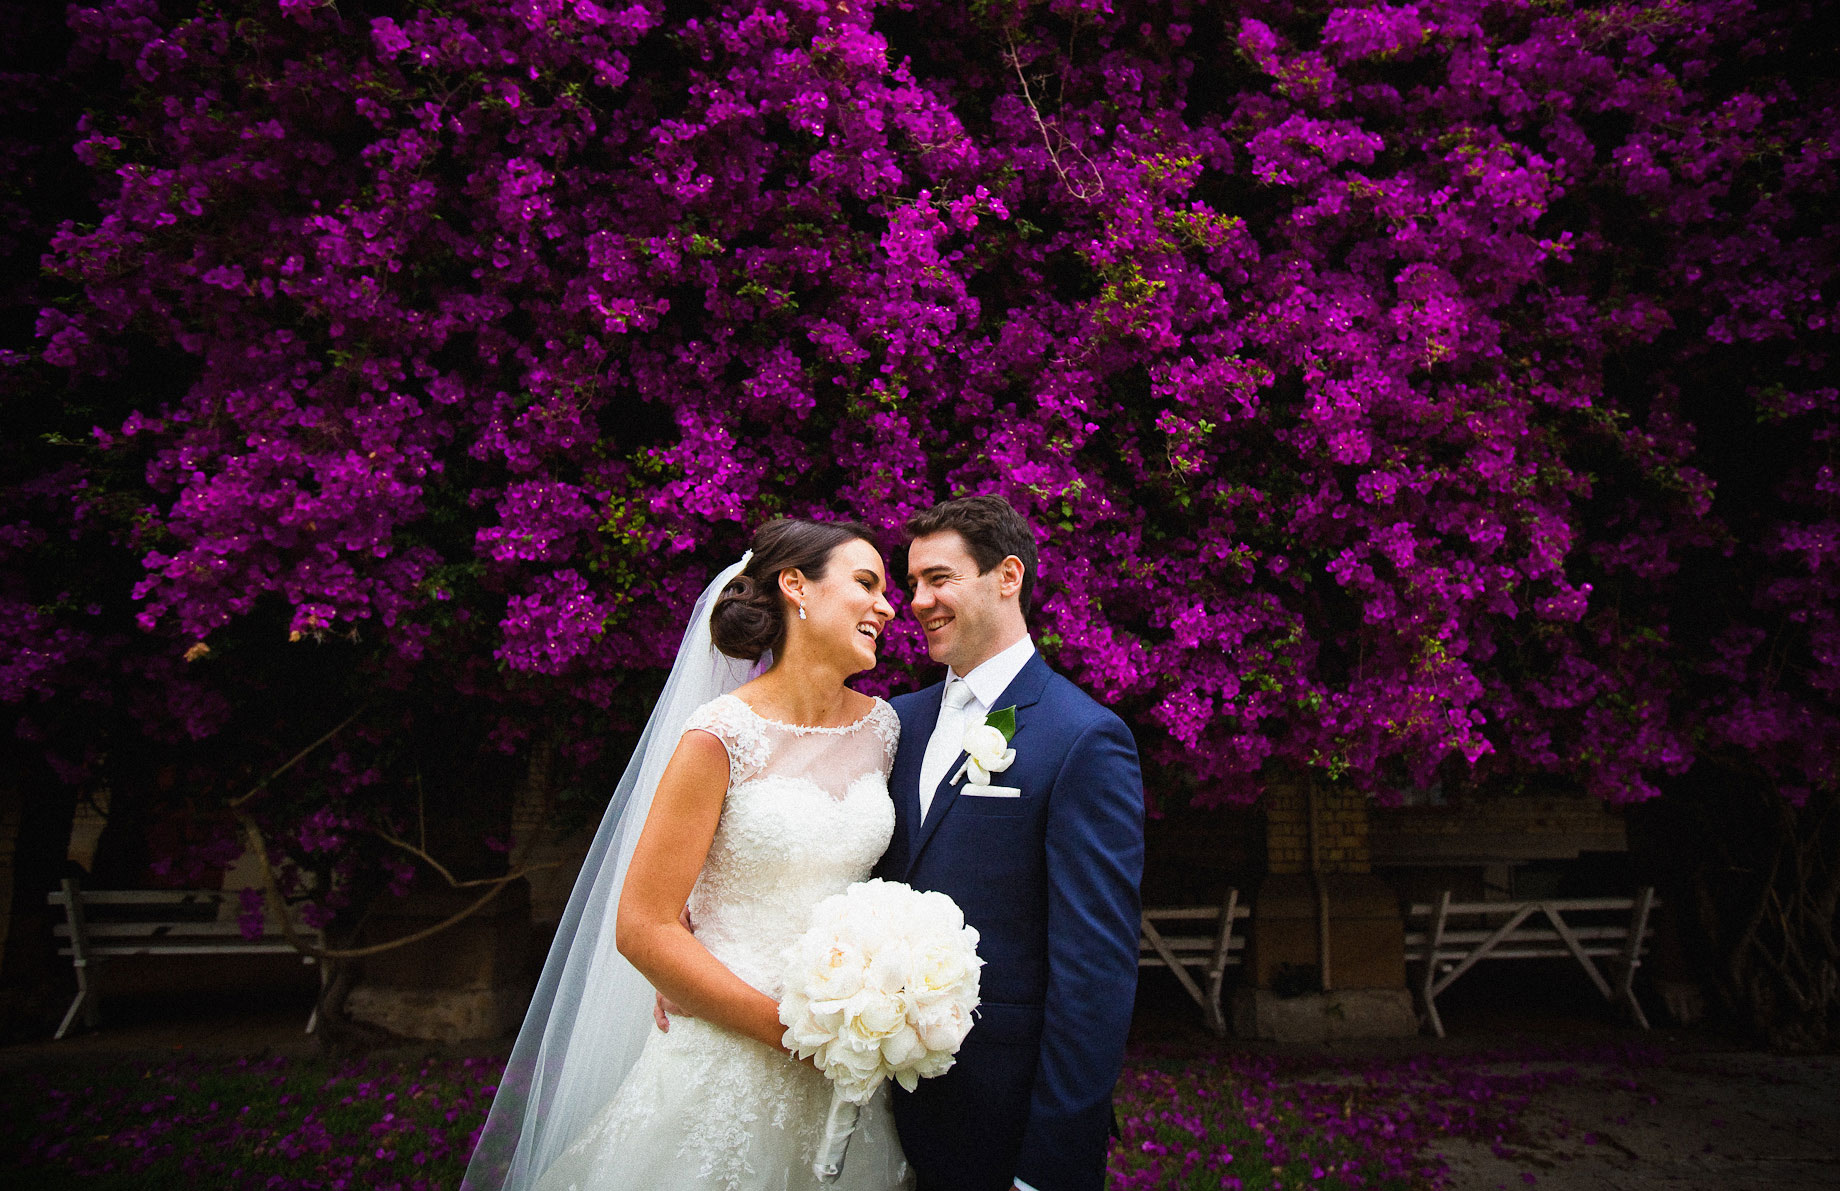 Colour wedding photo Riverview college flowers